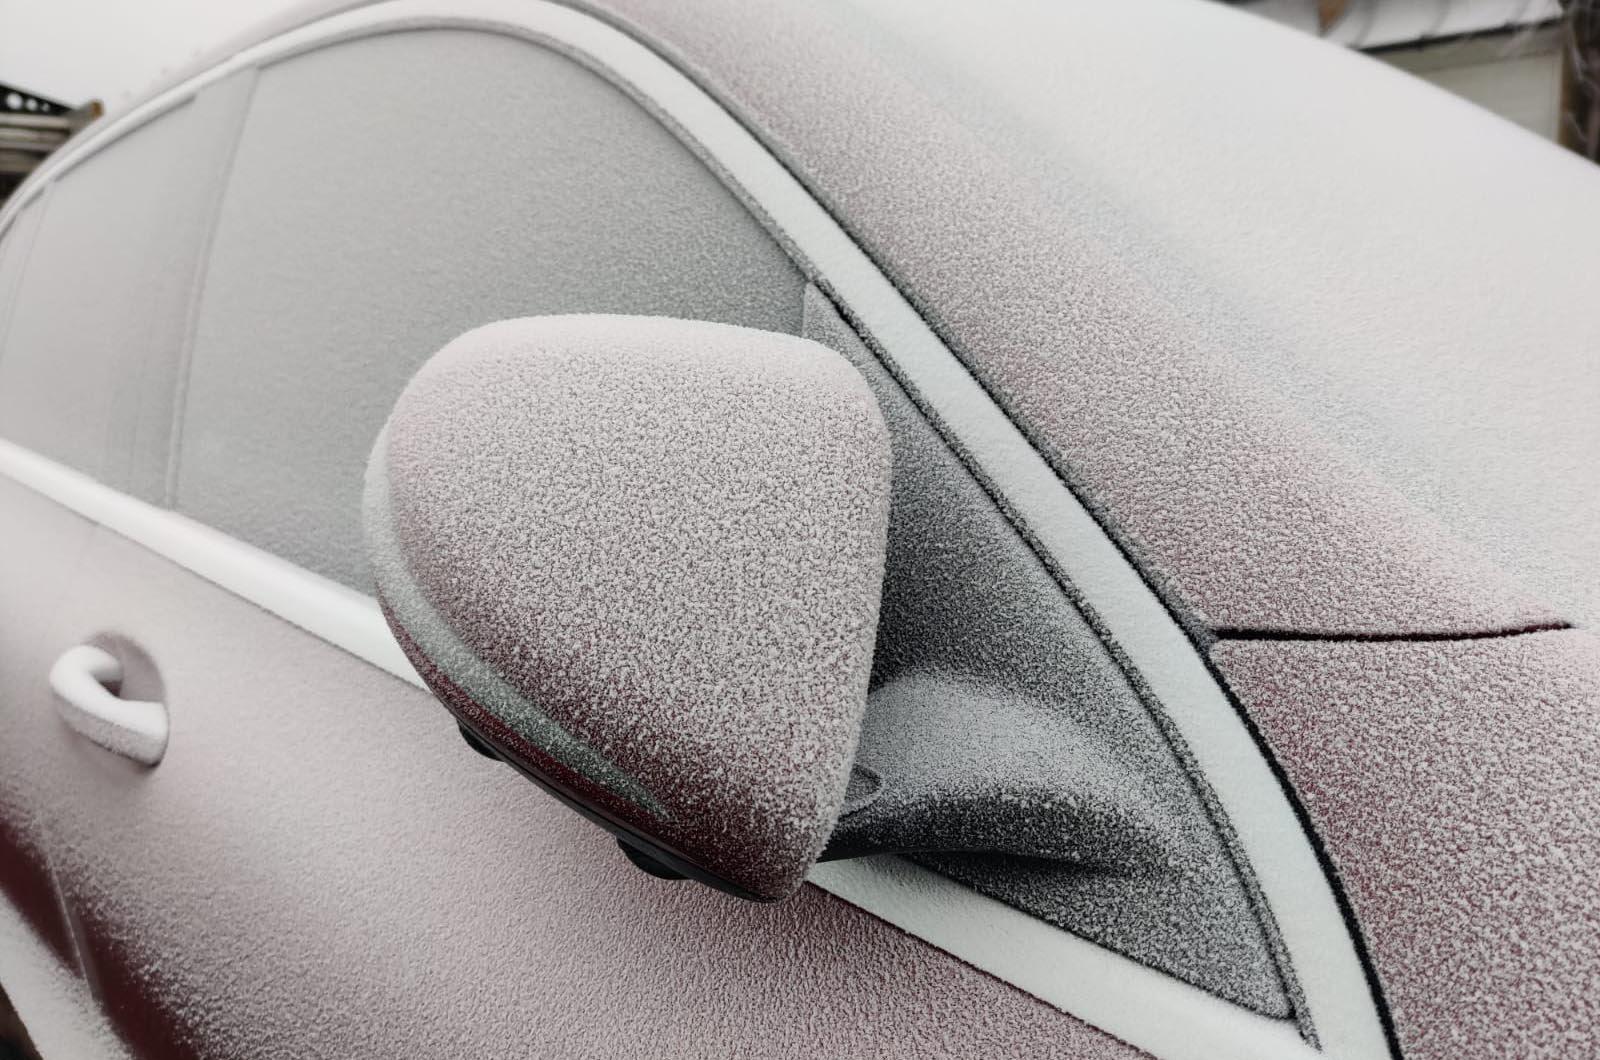 Mercedes EQC ice close up